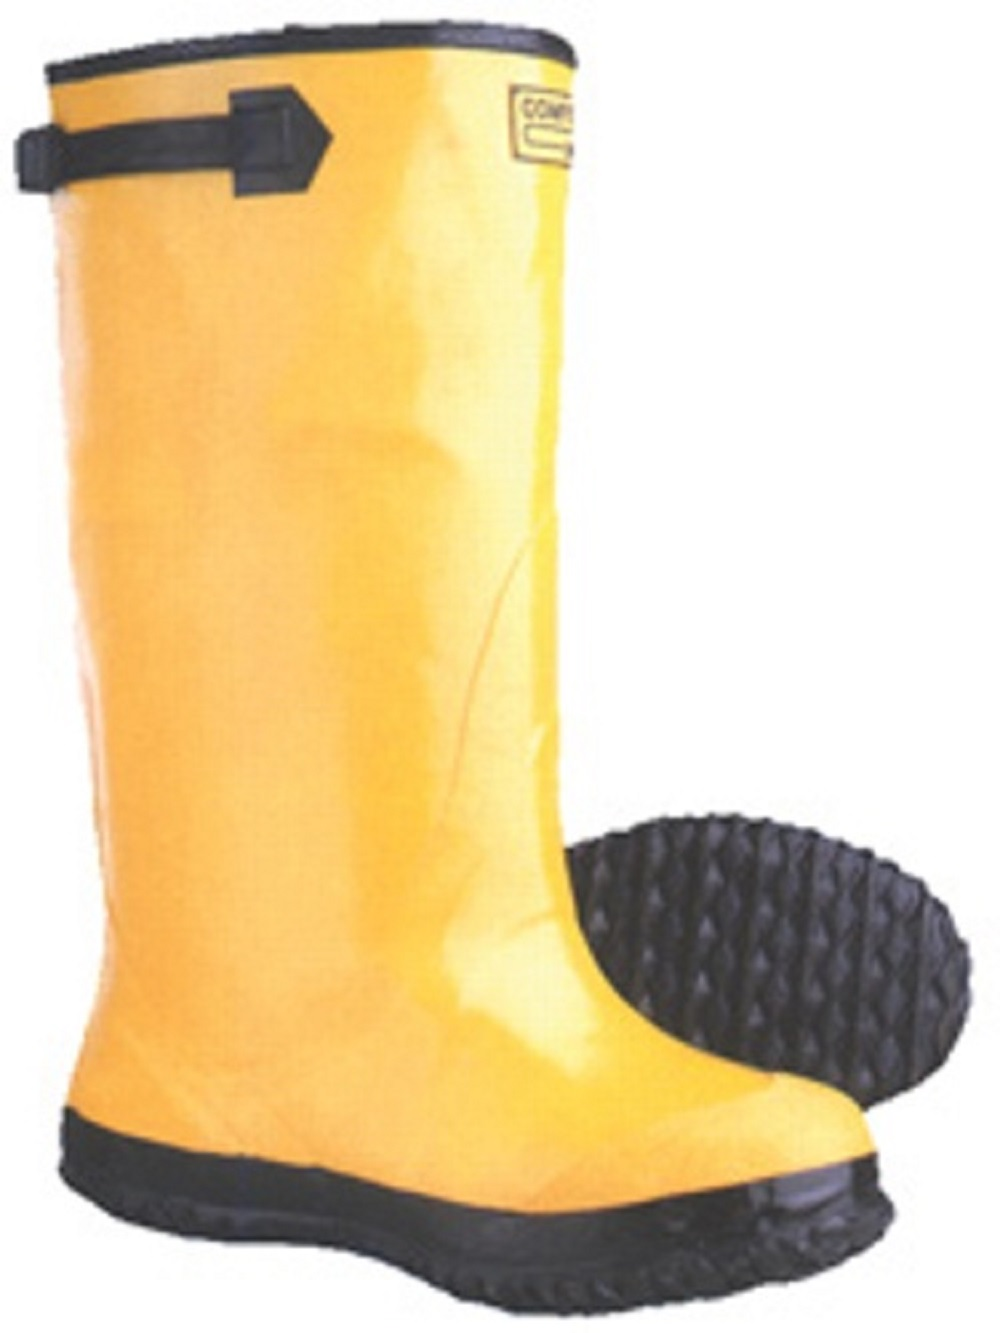 17'' Yellow Slush Boots, size 9 SLB-9